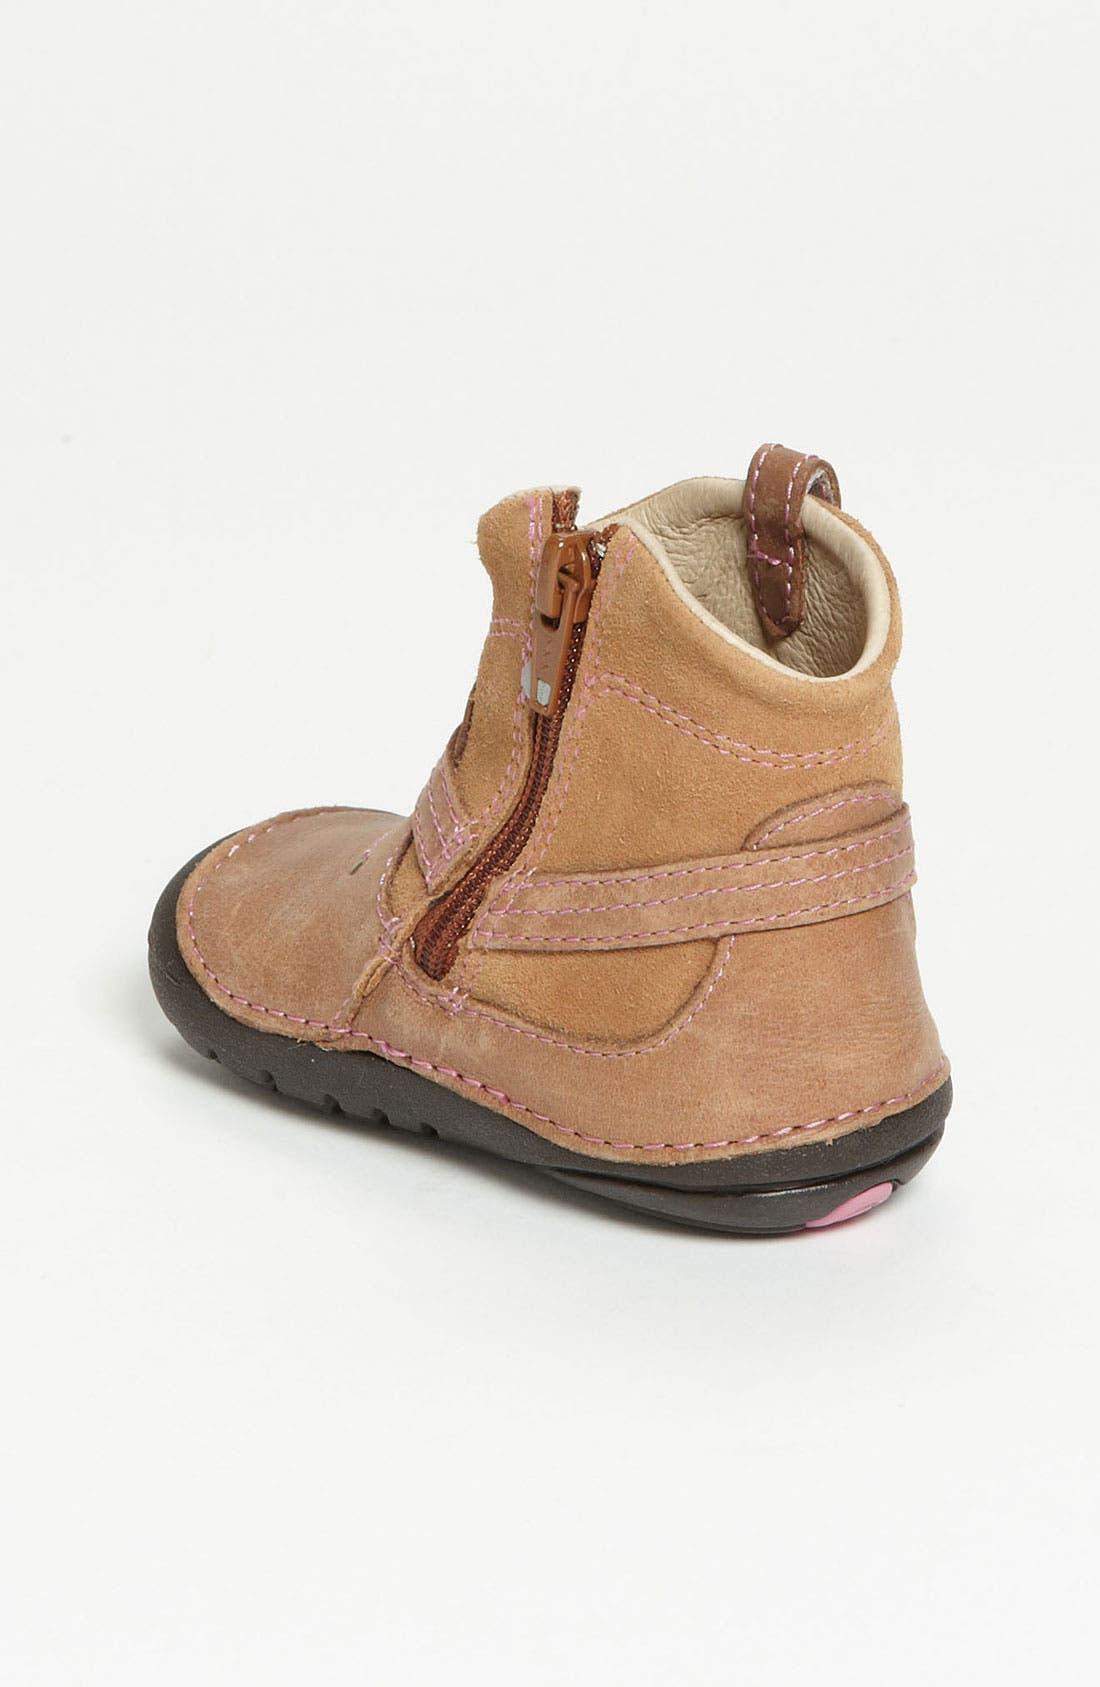 Alternate Image 2  - Stride Rite 'Heather' Boot (Baby & Walker)